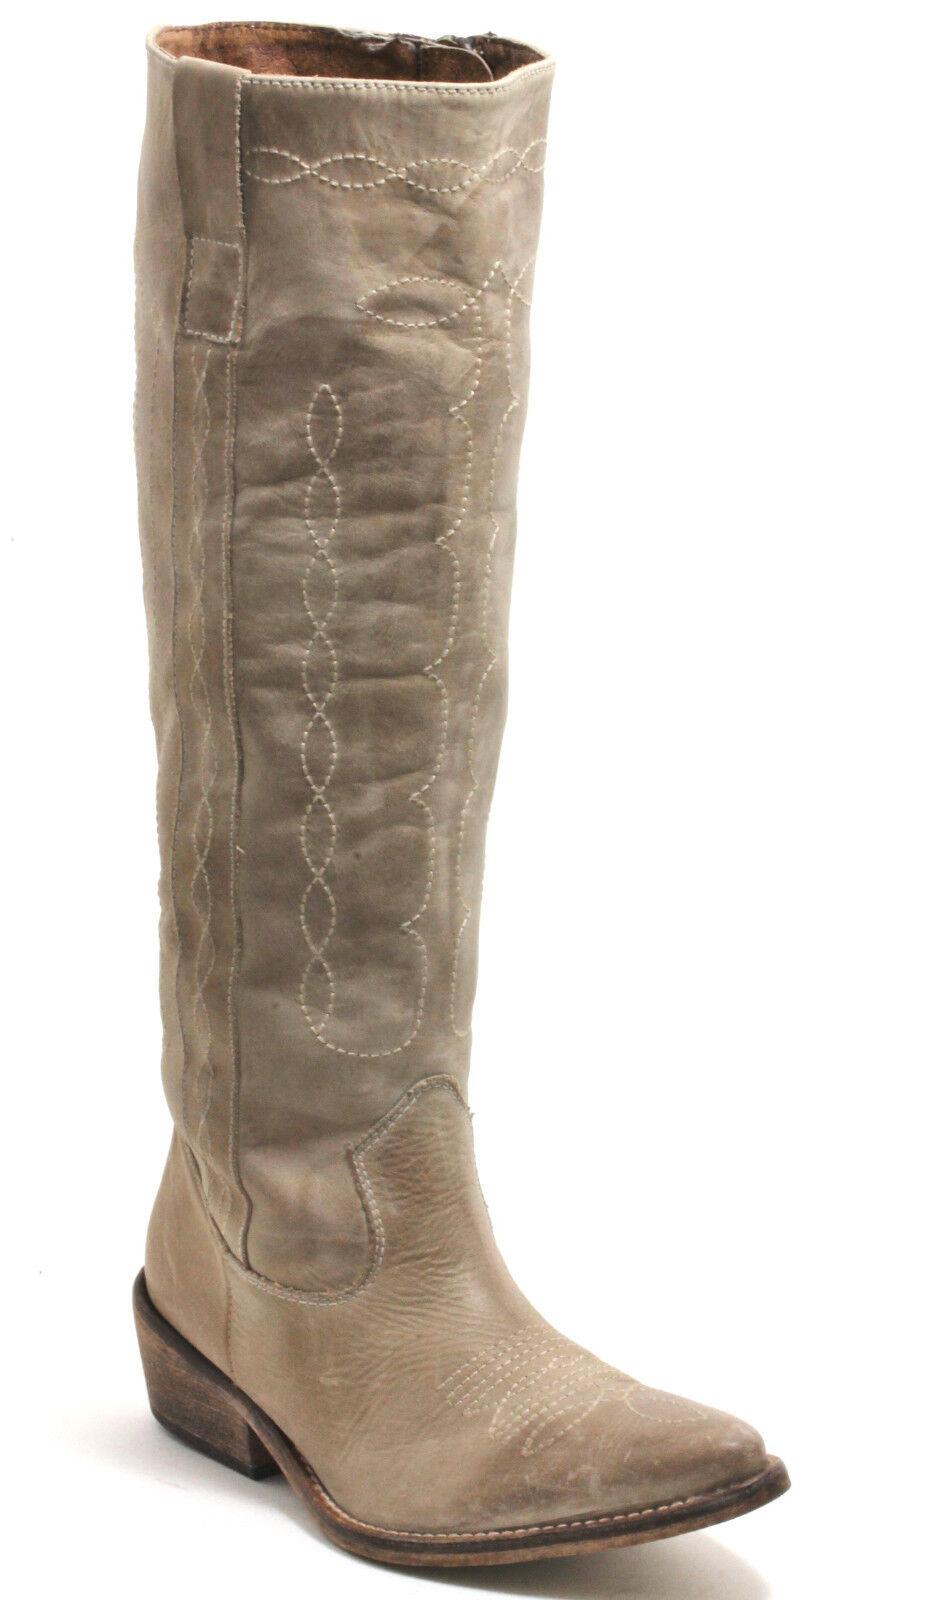 Western bottes bottes De Cowboy catalan Style Line Dance bottes femmes Buffalo 36